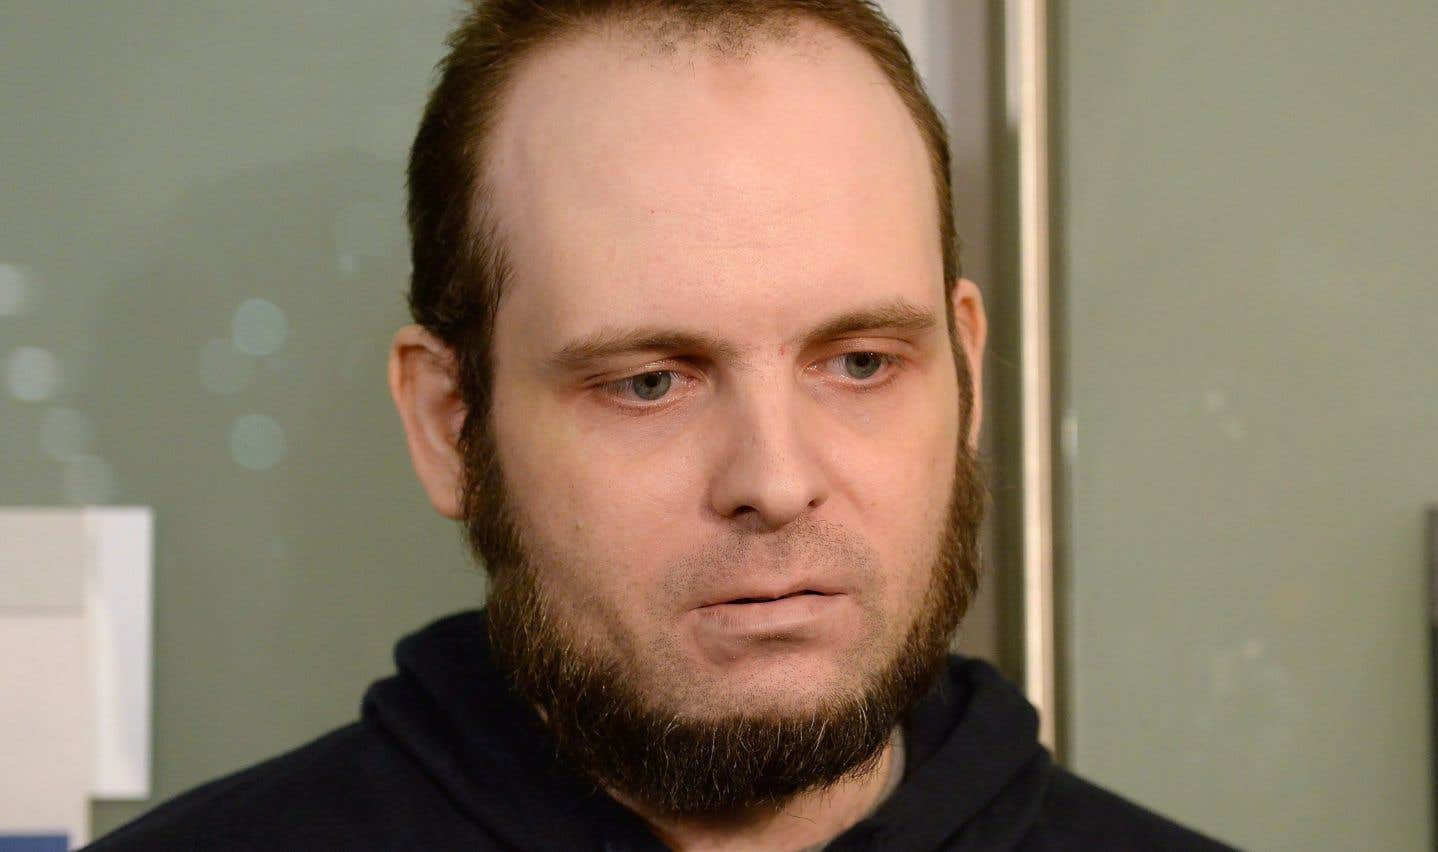 L'ex-otage canadien Joshua Boyle